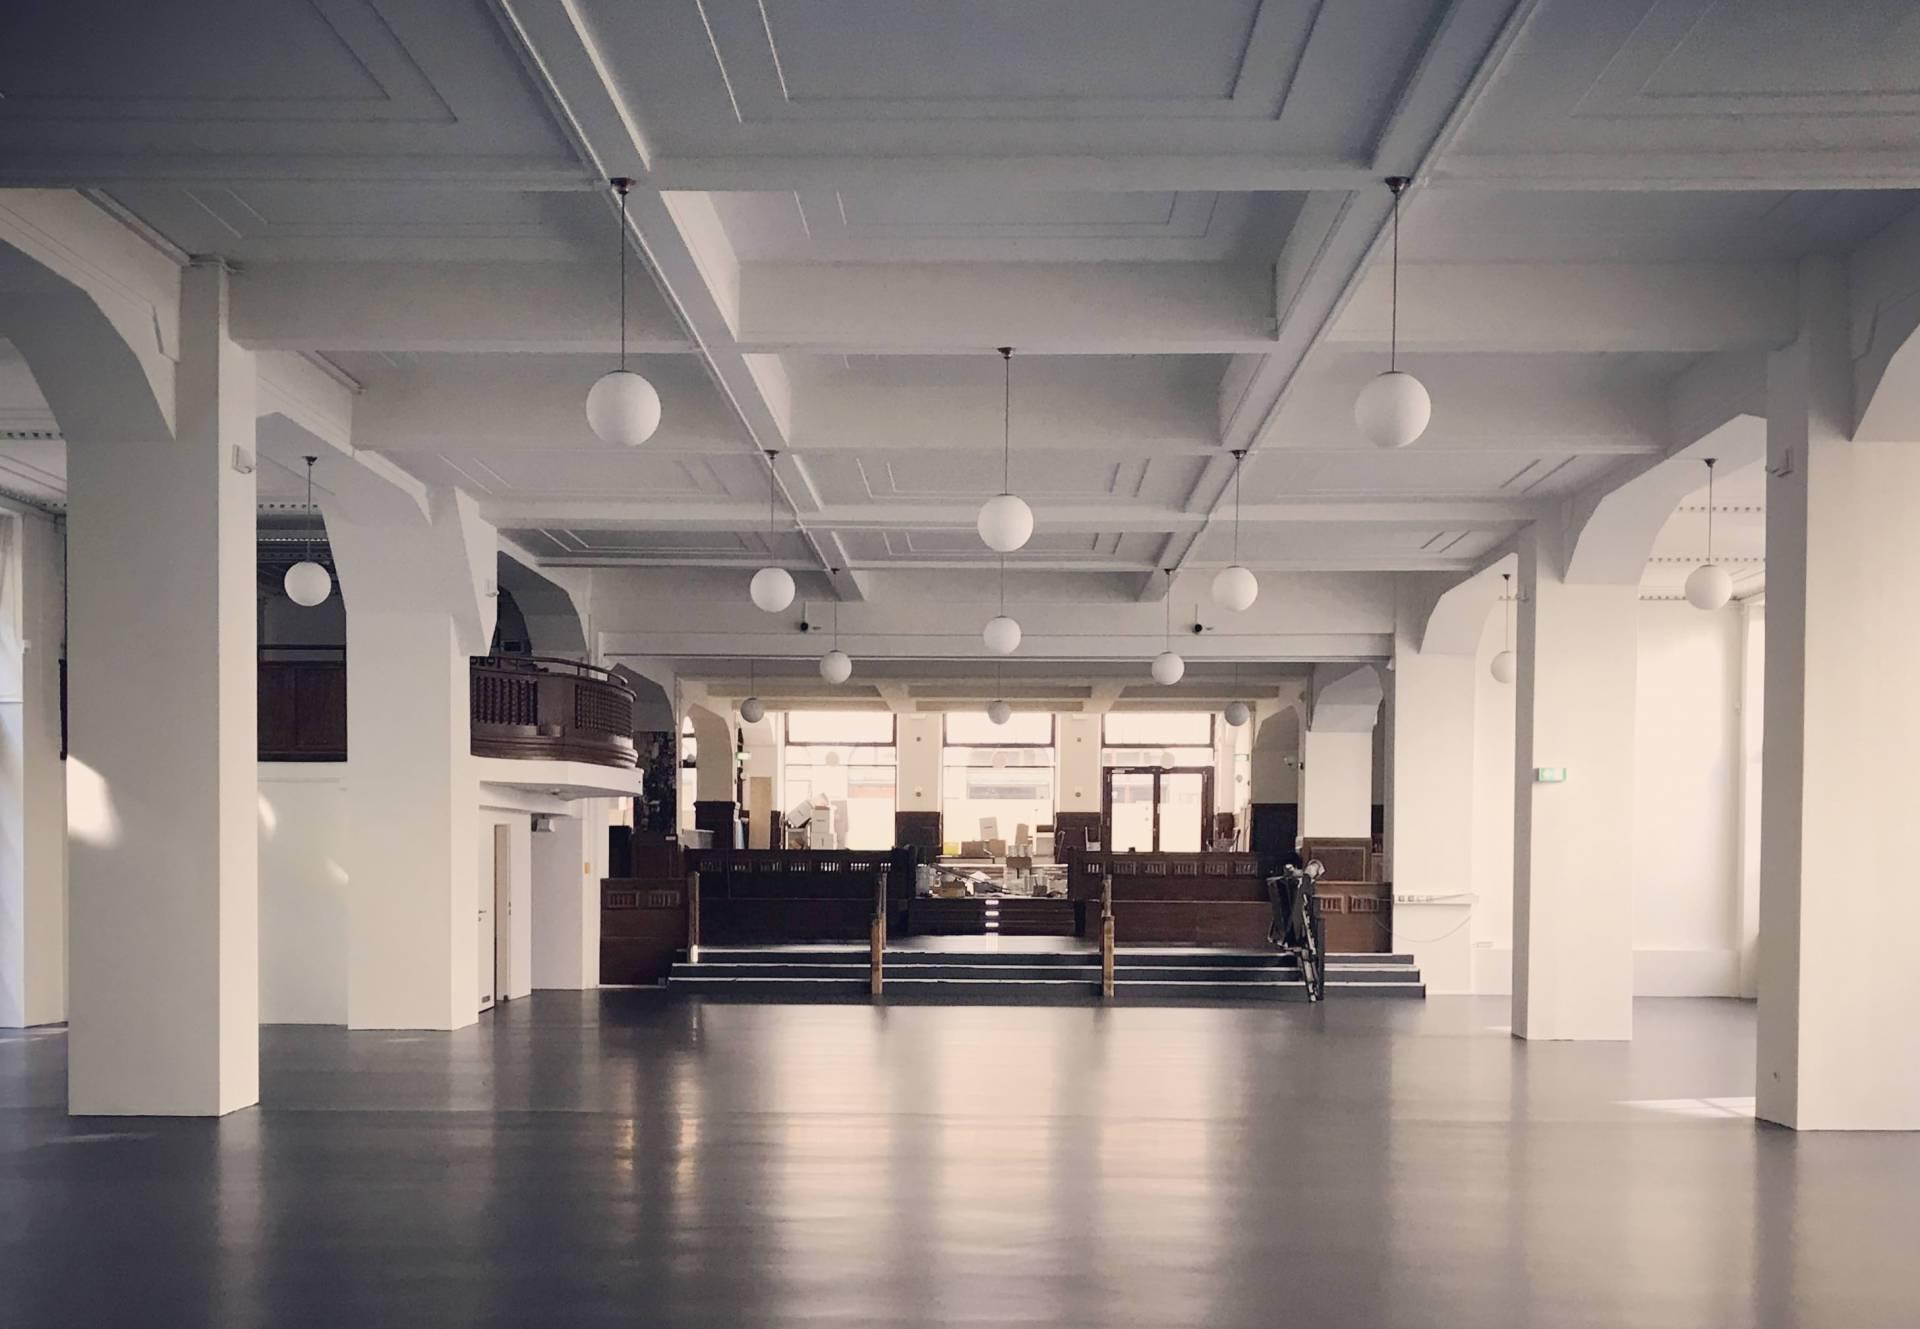 Umbau Kupfersaal August 2017 (Umbau zum Kupfersaal, Blick zur Kupfergasse)